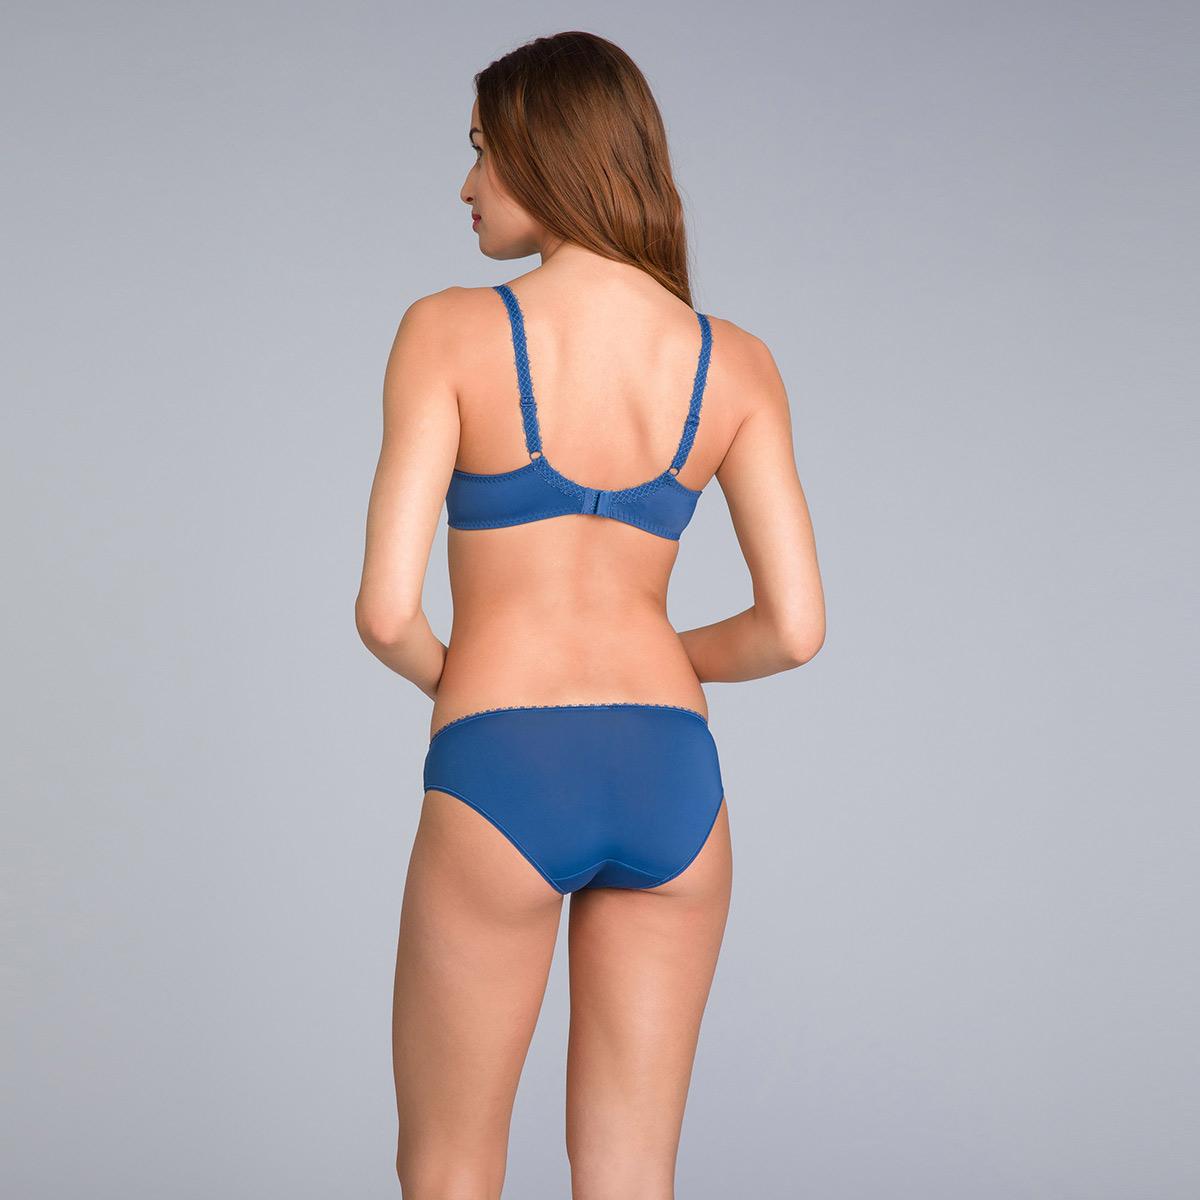 Bikini Knickers in Lace & Microfibre Navy Blue Print - Flower Elegance - PLAYTEX